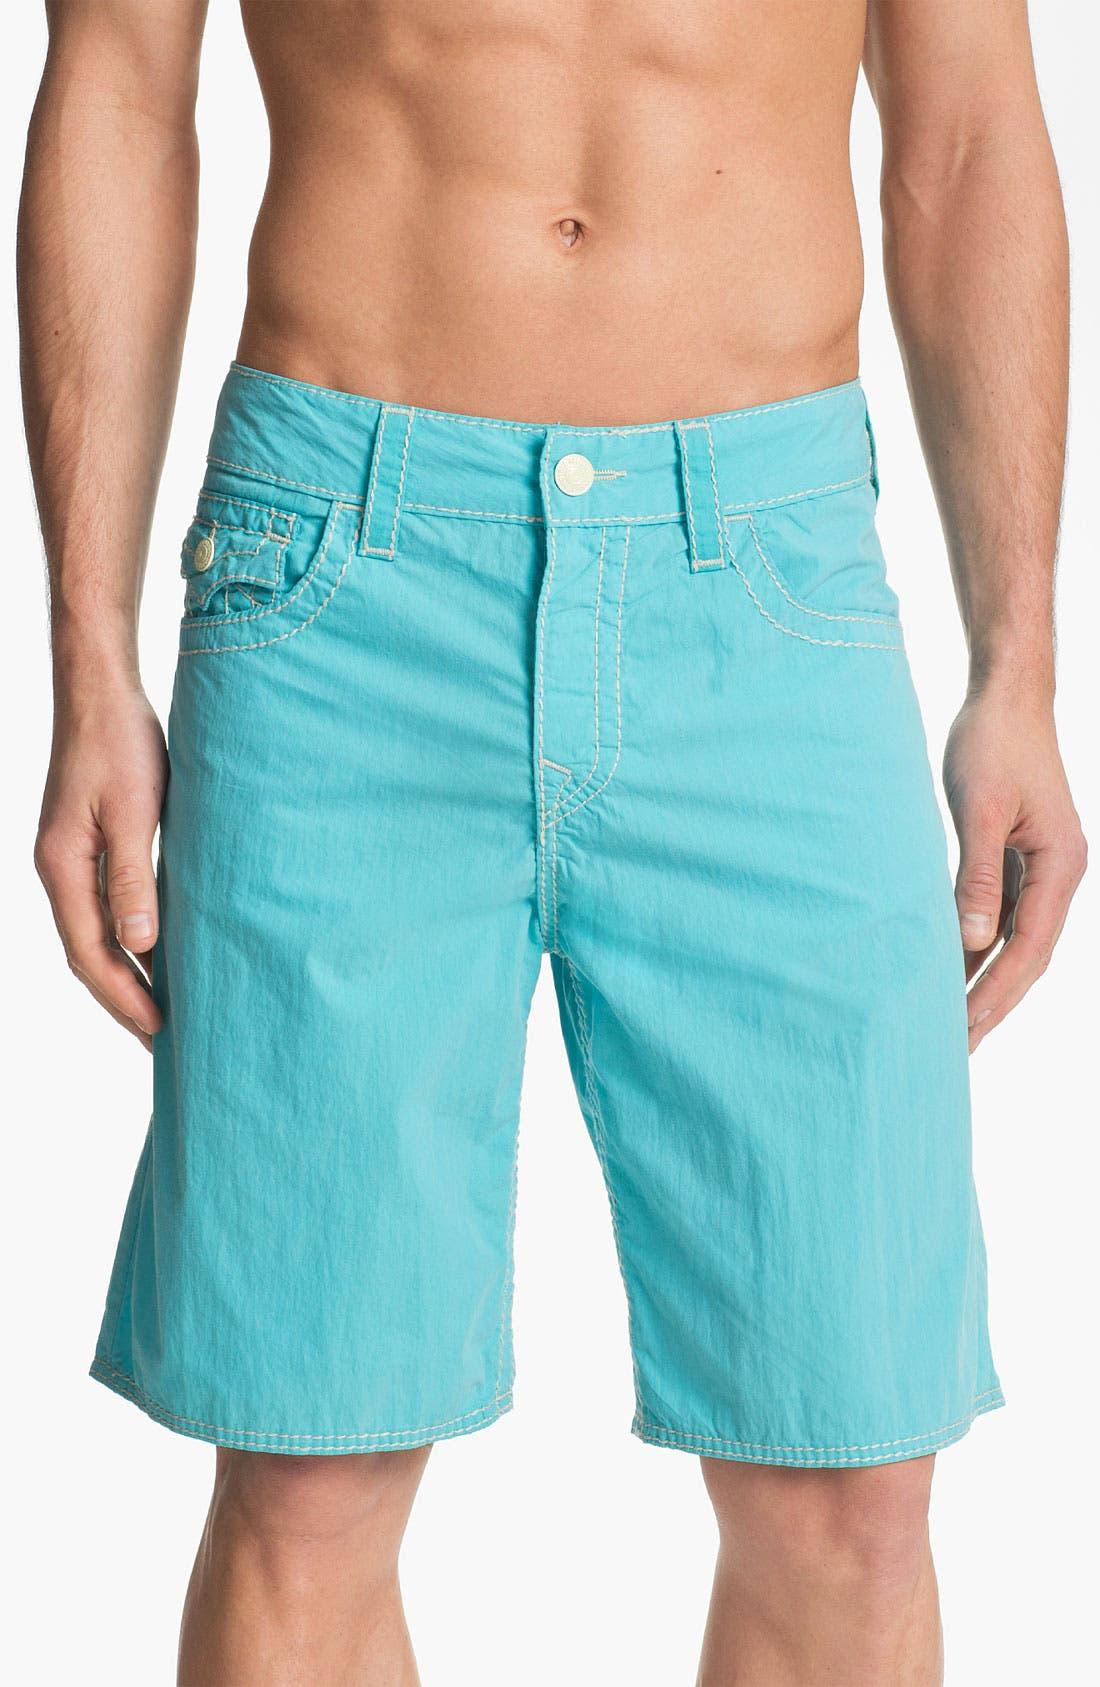 Alternate Image 2  - True Religion Brand Jeans 'Big T' Board Shorts